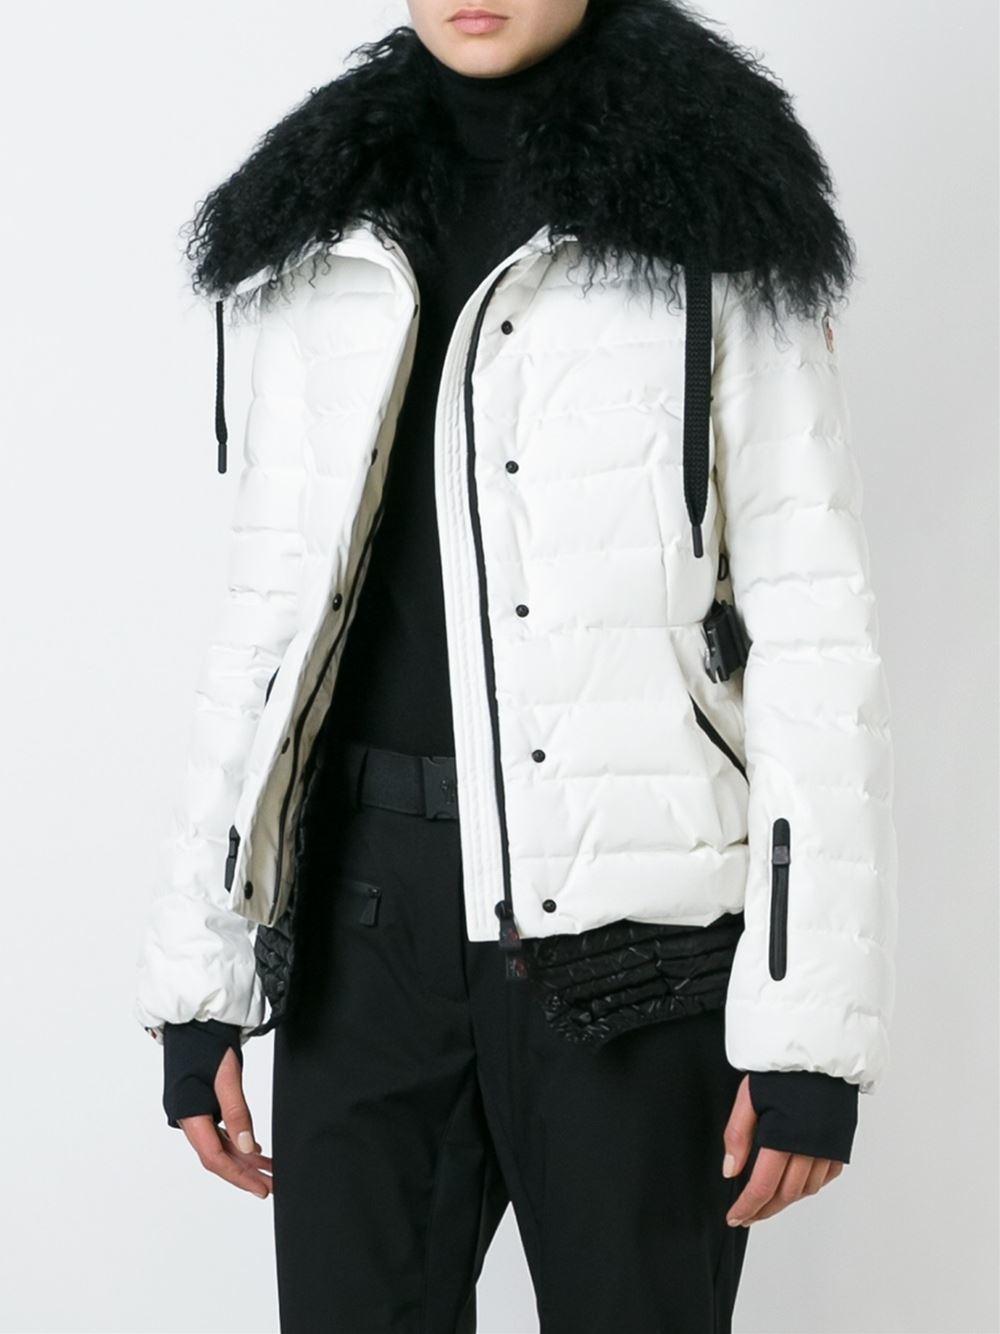 68d8e8b6aea6 Moncler Grenoble Lamb Fur Collar Padded Jacket in White - Lyst